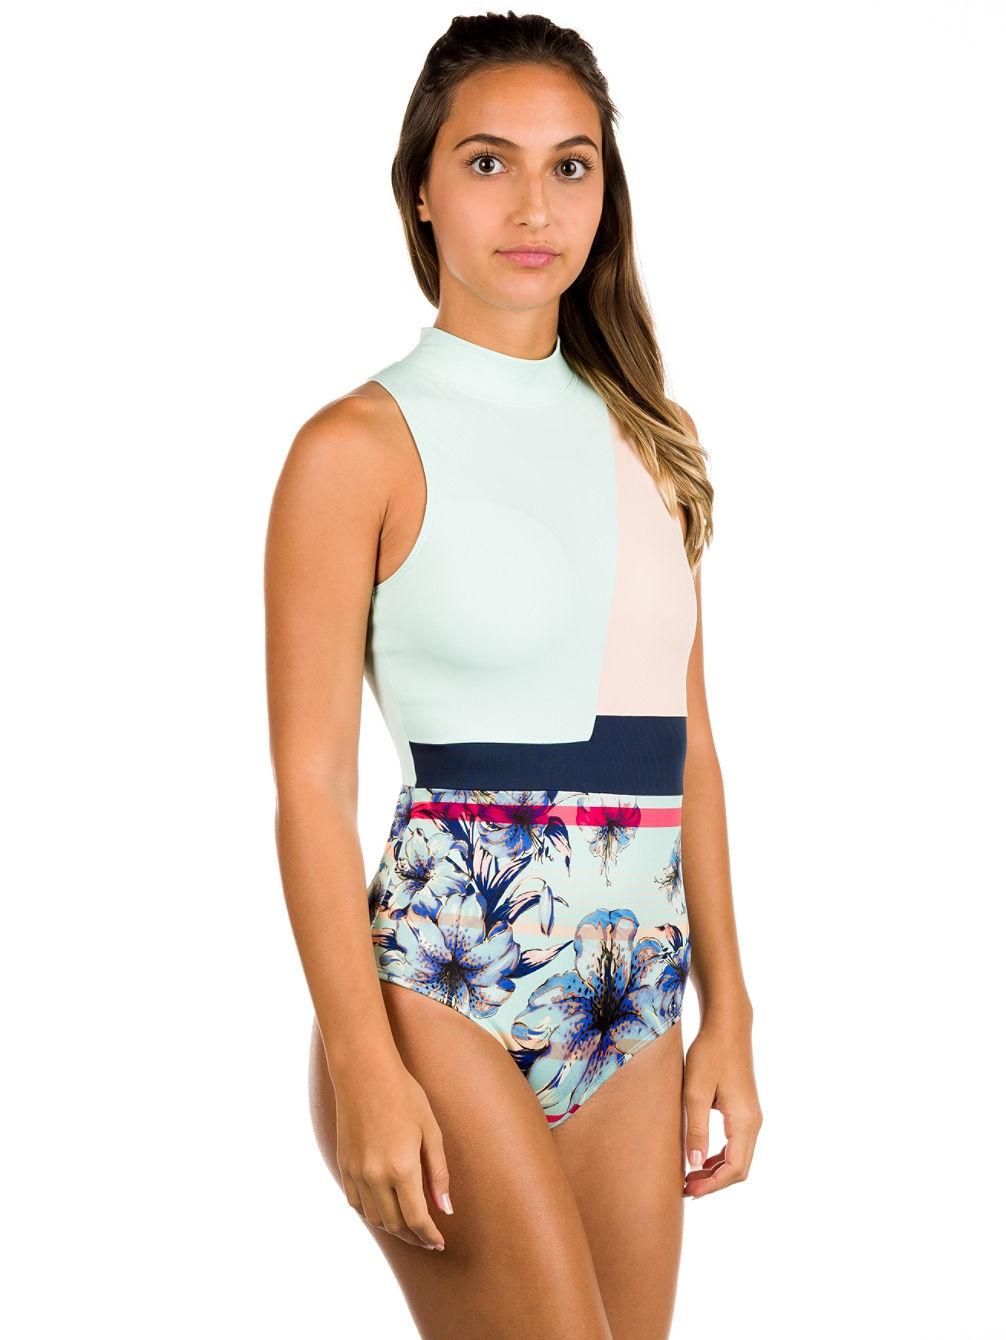 647e18ce29 Buy Roxy Pop Surf Fashion Swimsuit online at Blue Tomato